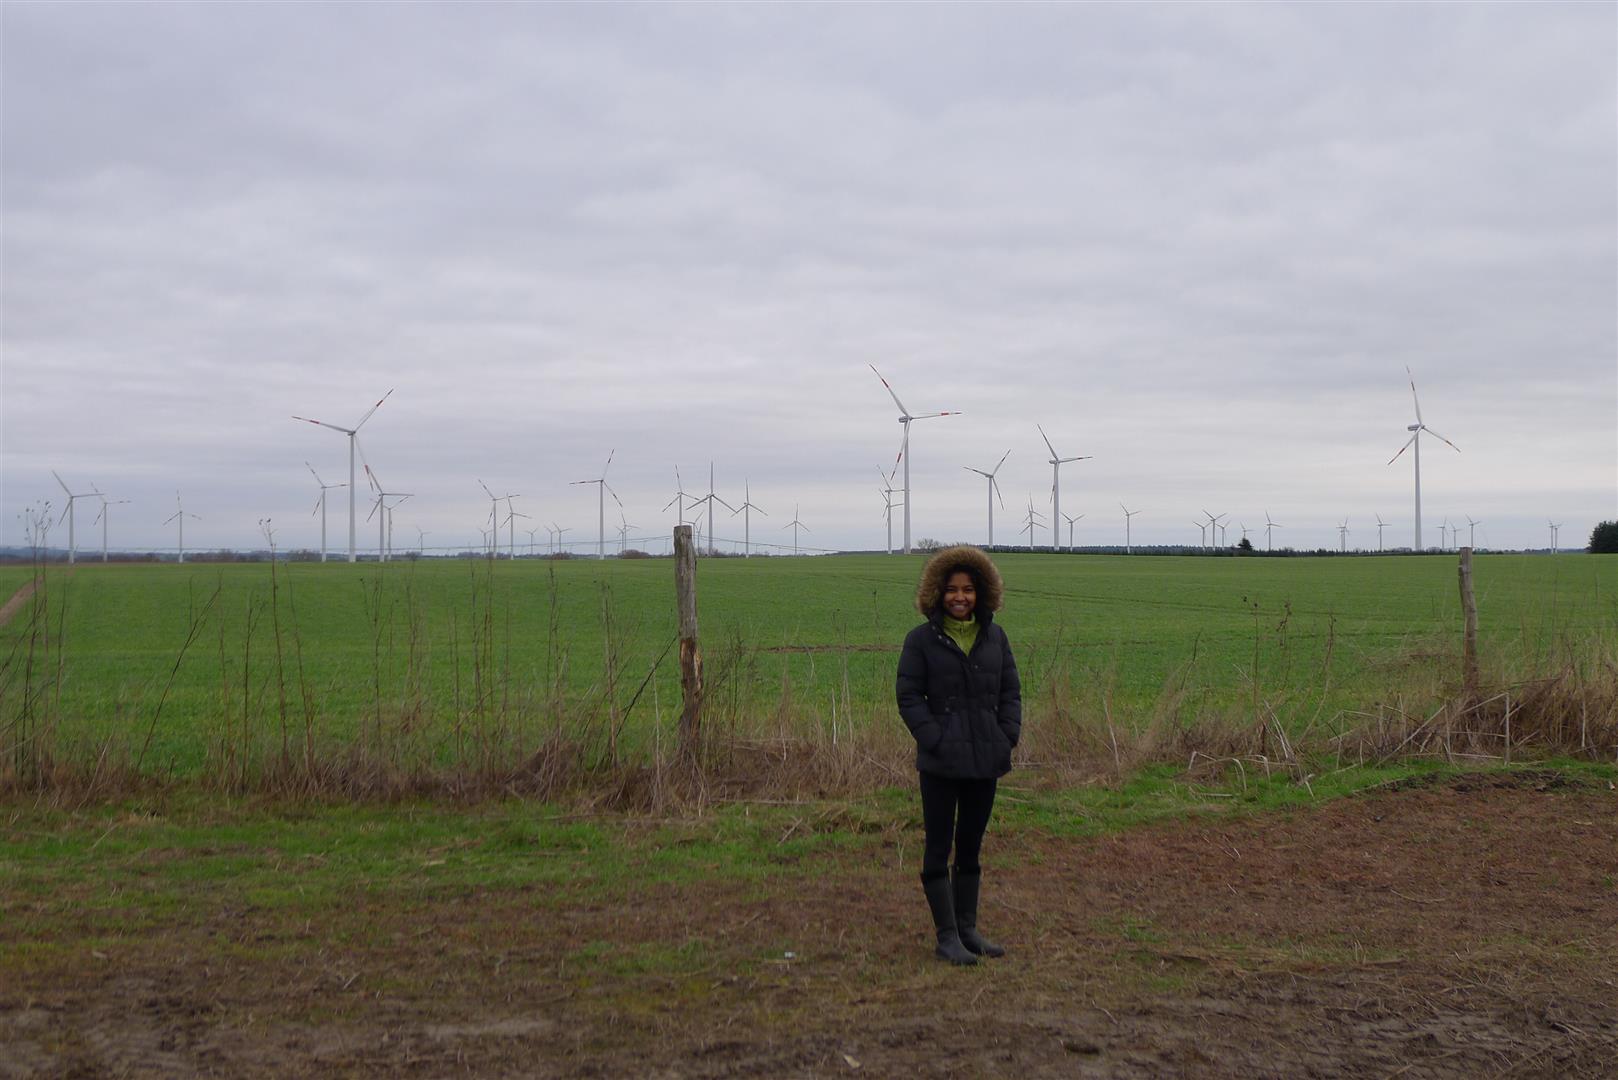 4-rani-and-windmills